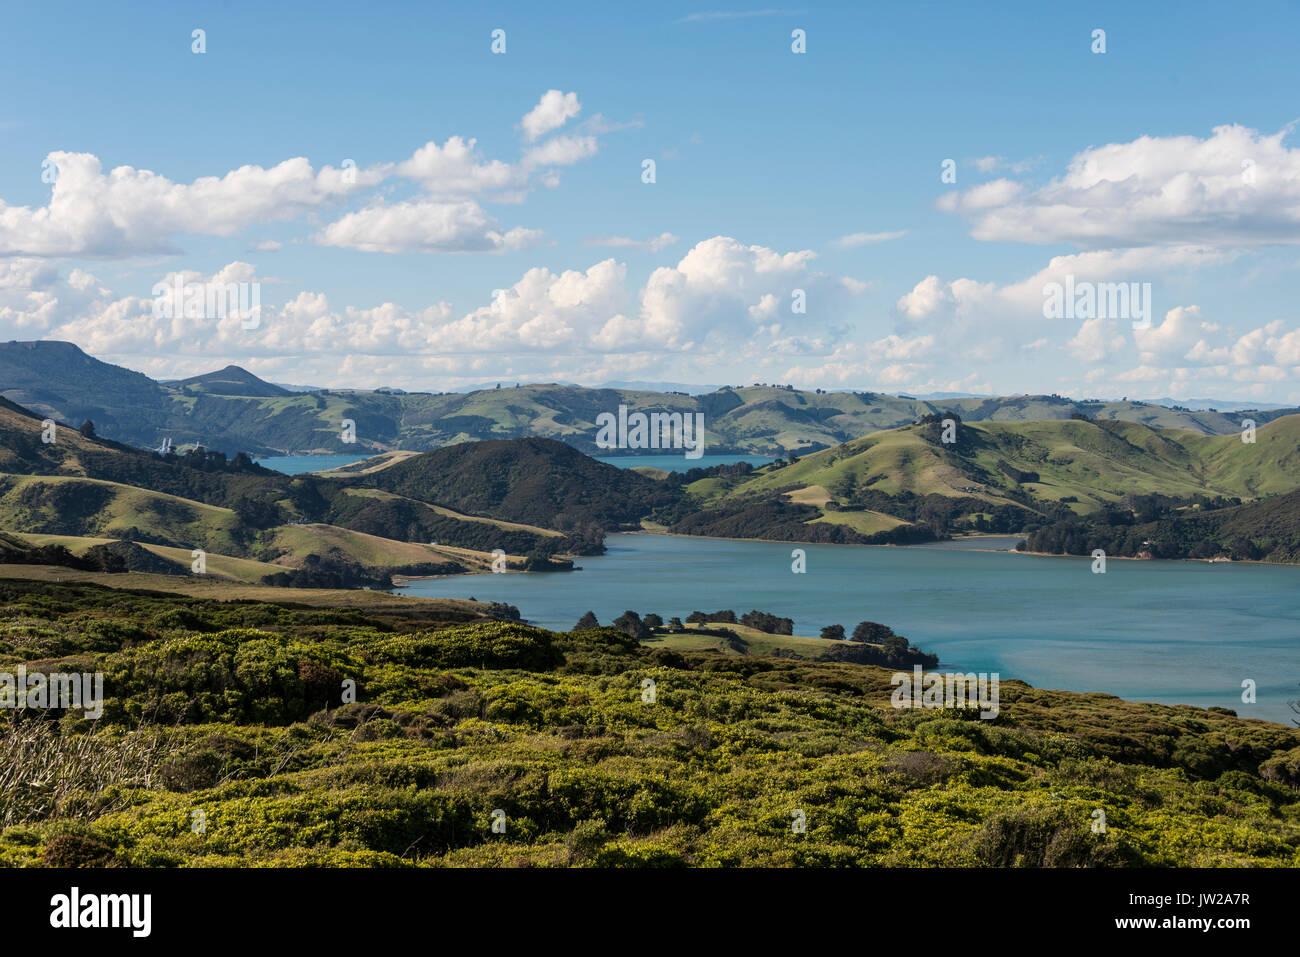 Ingresso Hoopers, ingresso nel verde paesaggio collinare, Dunedin, Penisola di Otago, Isola del Sud, Nuova Zelanda, Oceania Immagini Stock